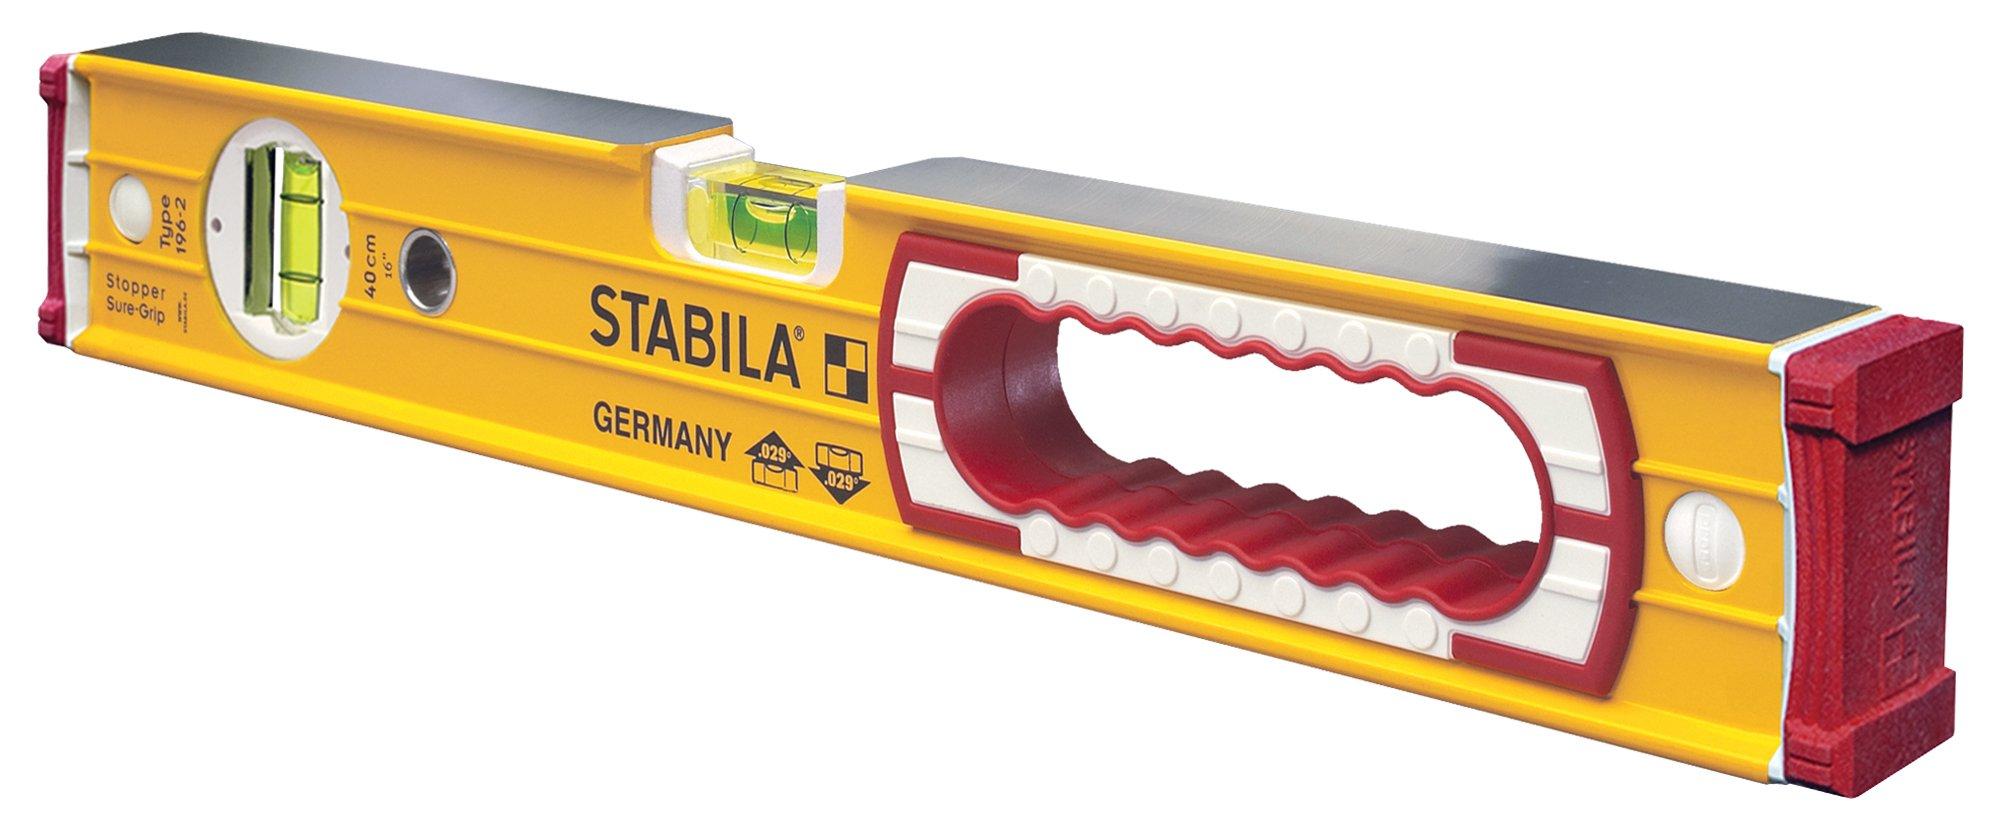 Stabila 37416 Heavy Duty Type 196 16'' Level by Stabila